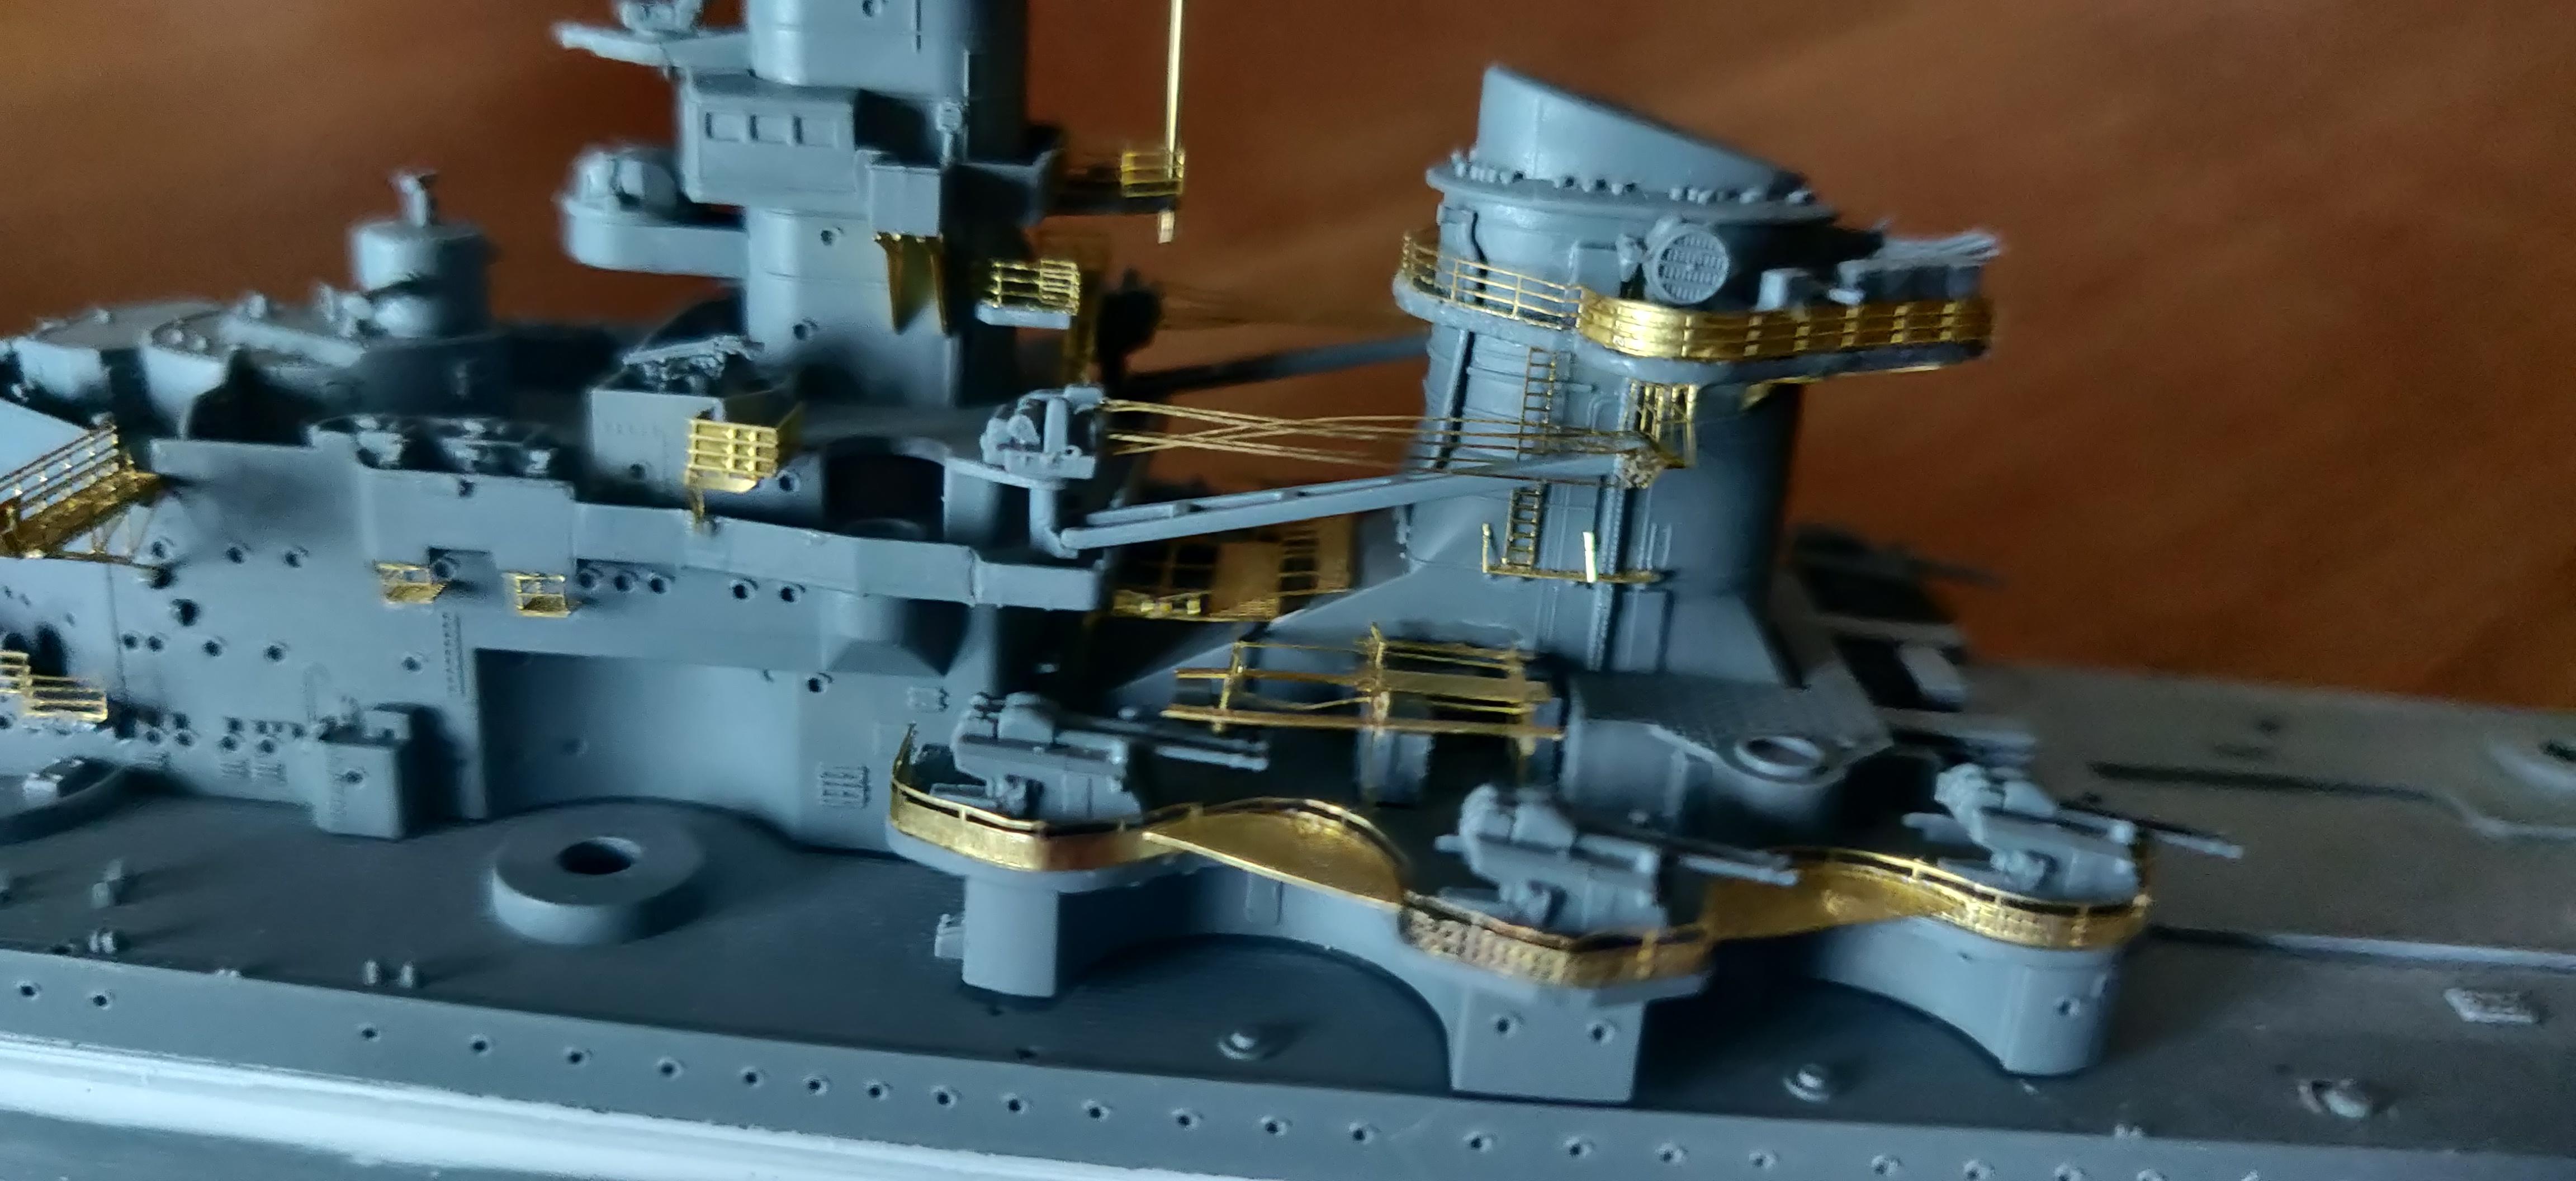 scharnhorst flyhawk 1943 1/700 IMG_20200509_190920